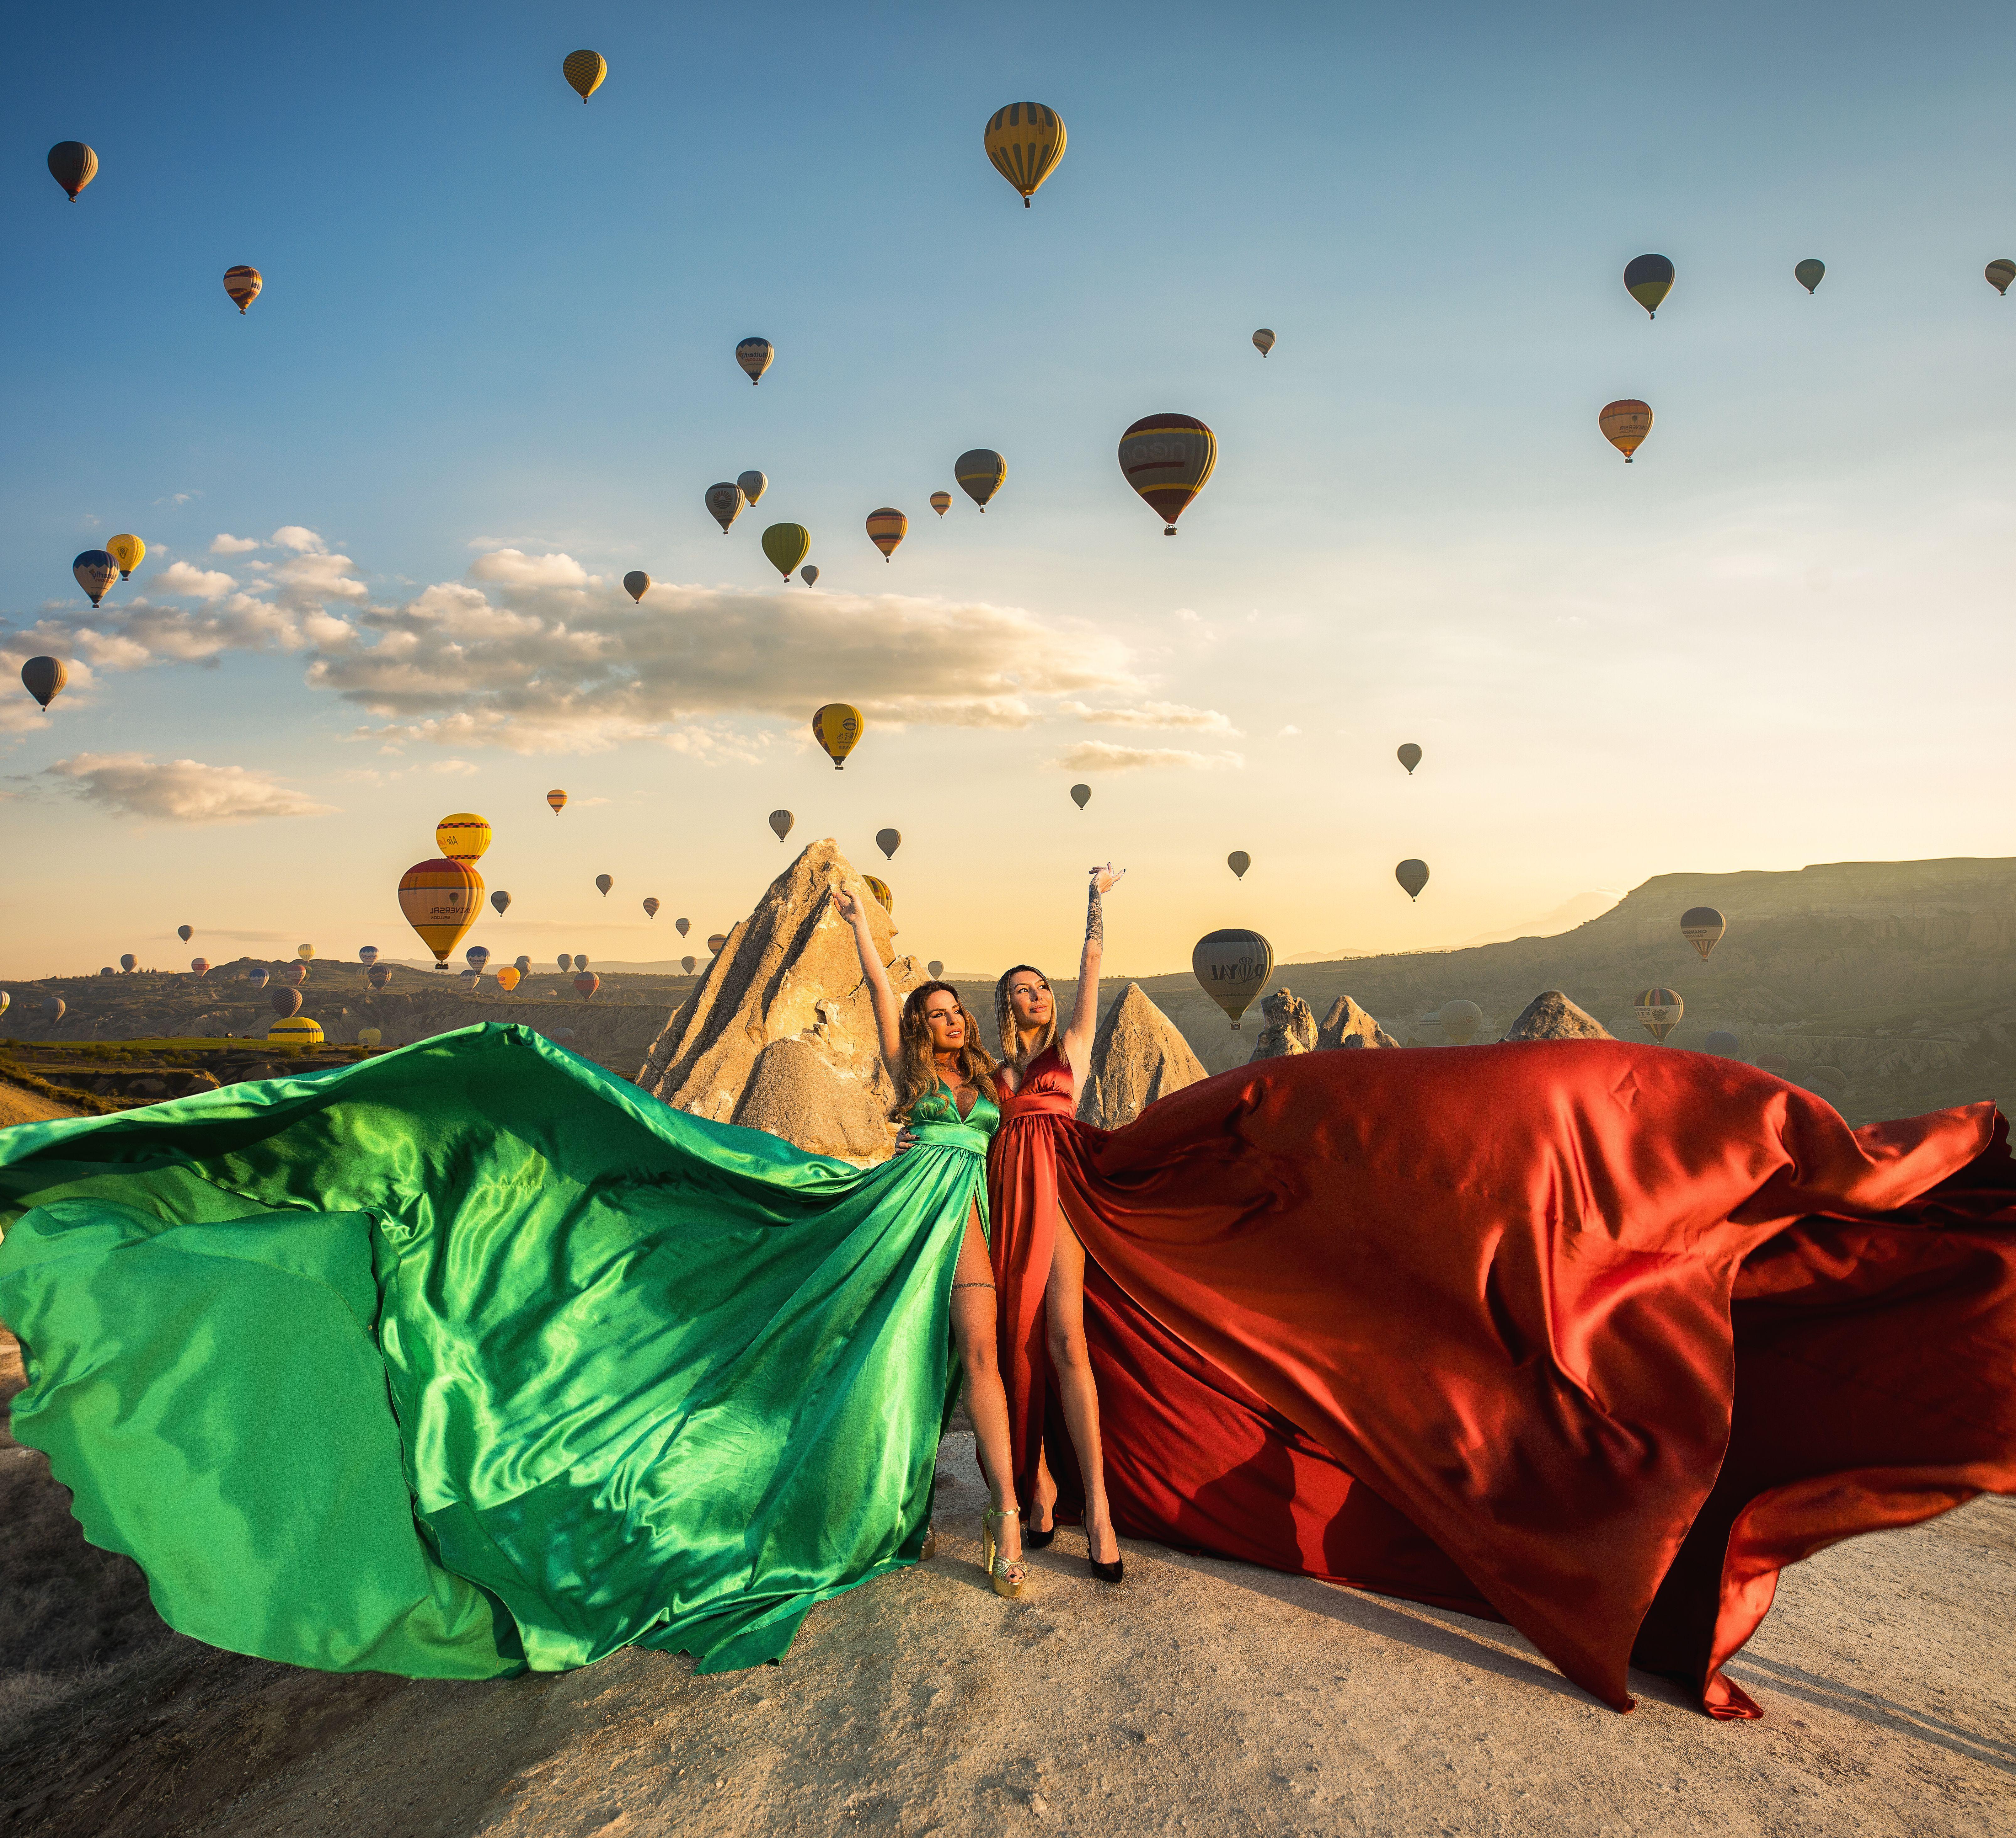 cappadocia couple Do you admire this lovely cappadocia dress the same way as we do . . . Book your dream photoshoot in Cappadocia DM us . . #cappadocia #cappadociarentdresses #flyingdress #couple . #cappadociatimes #igers #love #likers #summer #er #sunset #sky #cute #me #byburakyldrm #beautifulview #tbt #bestoftheday #like4like #likeforlike #awesome #travel #holiday #turkey #turkiyem #kapadokya # #landscape #fantastic #museumhotel